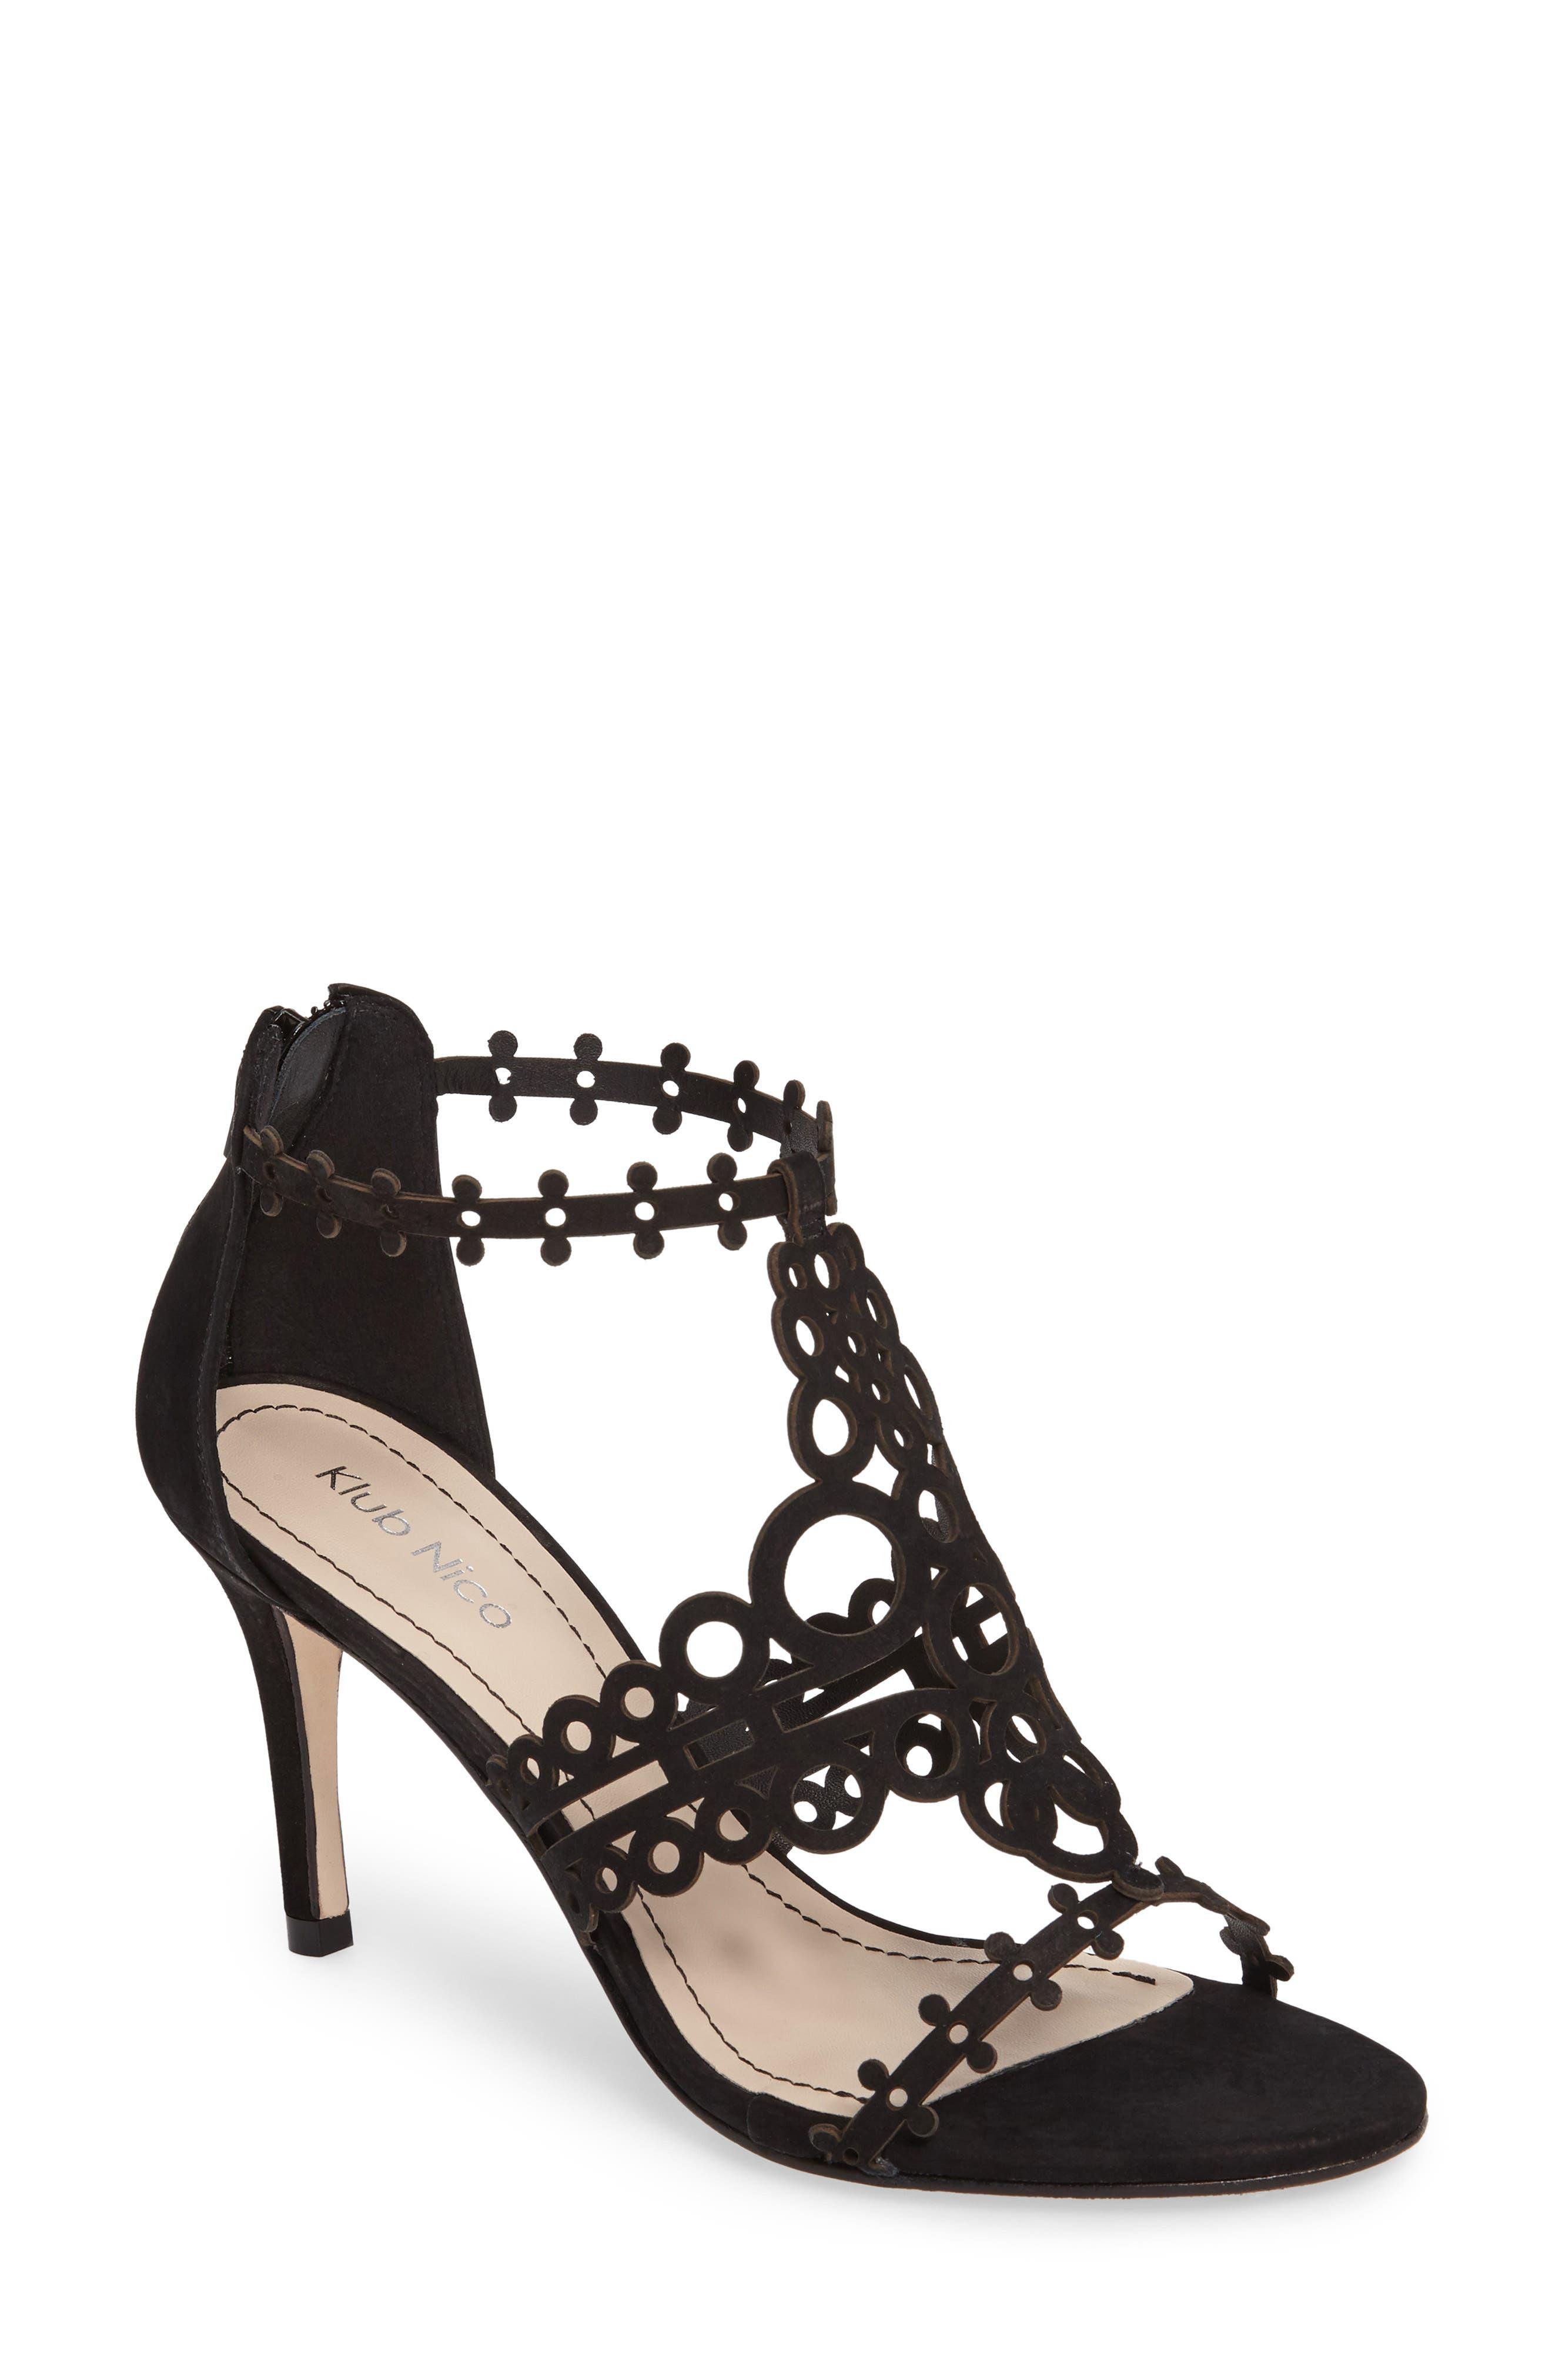 Alternate Image 1 Selected - Klub Nico 'Antonia' Laser Cut T-Strap Sandal (Women)